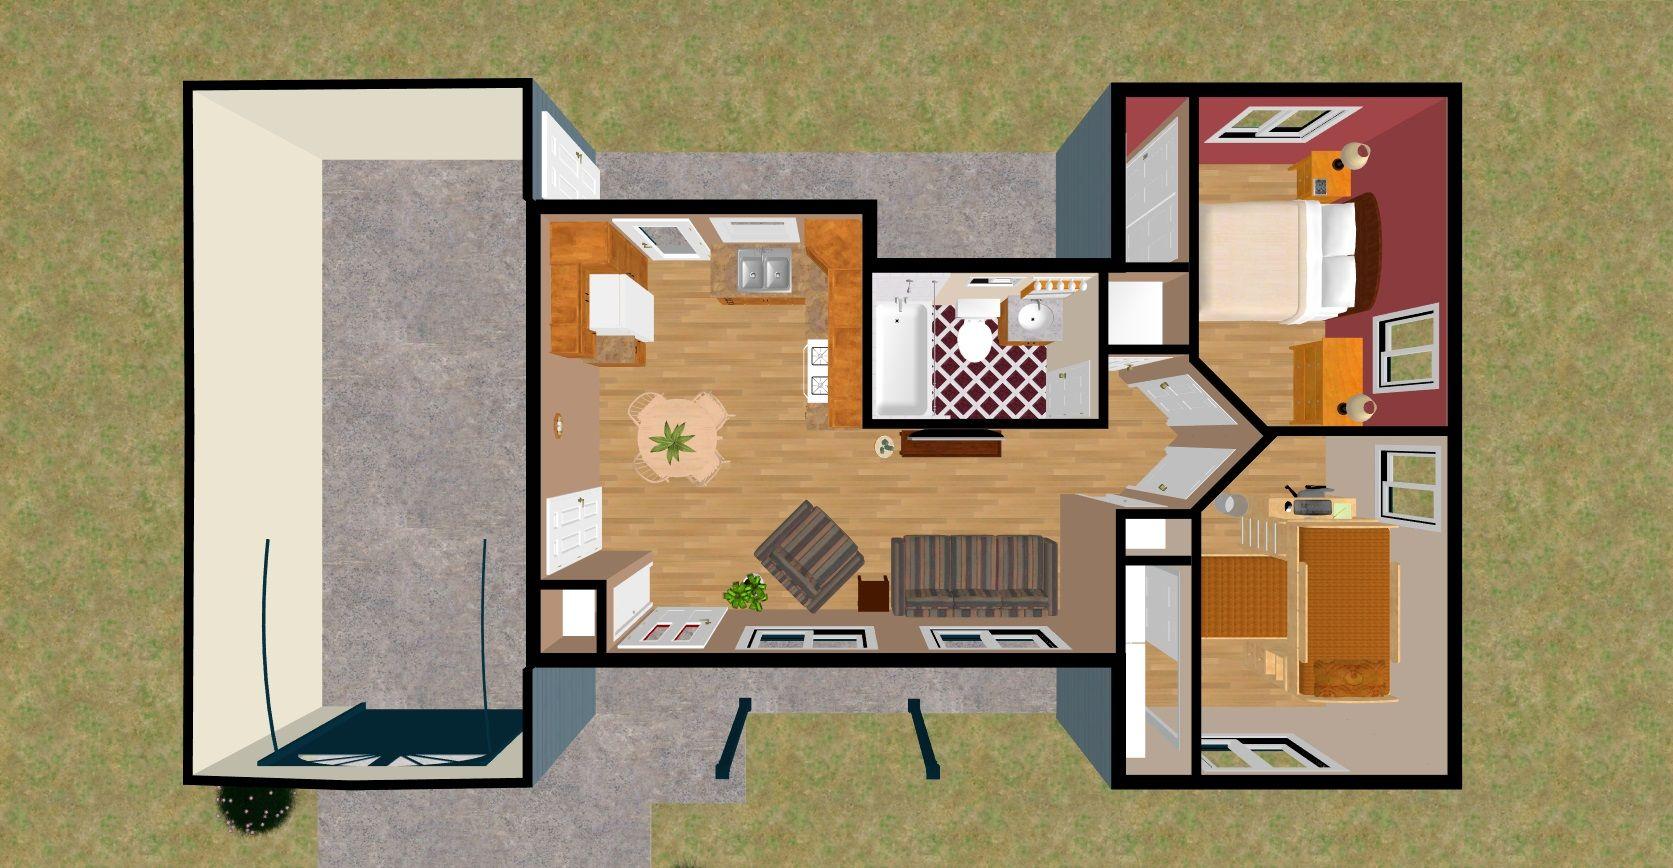 Cozy Home Plans - Part 2 Tiny Bedroom